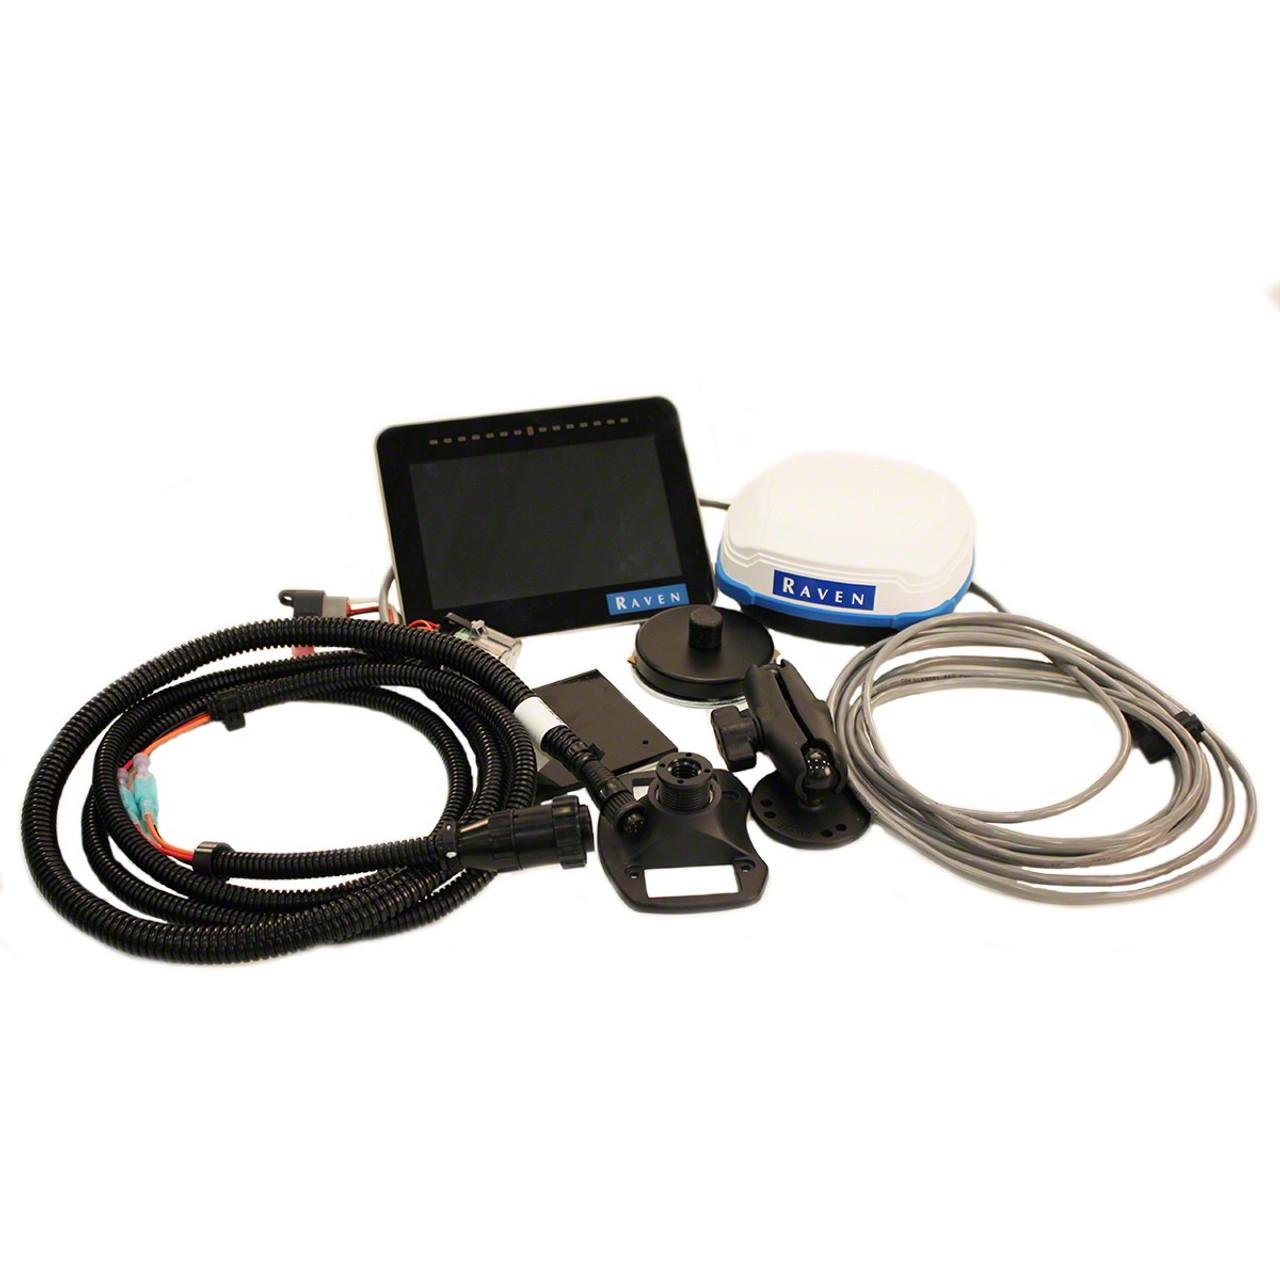 small resolution of raven 450 sprayer wiring harness wiring diagram splitbuy raven field gps ag systems precision cr7 field